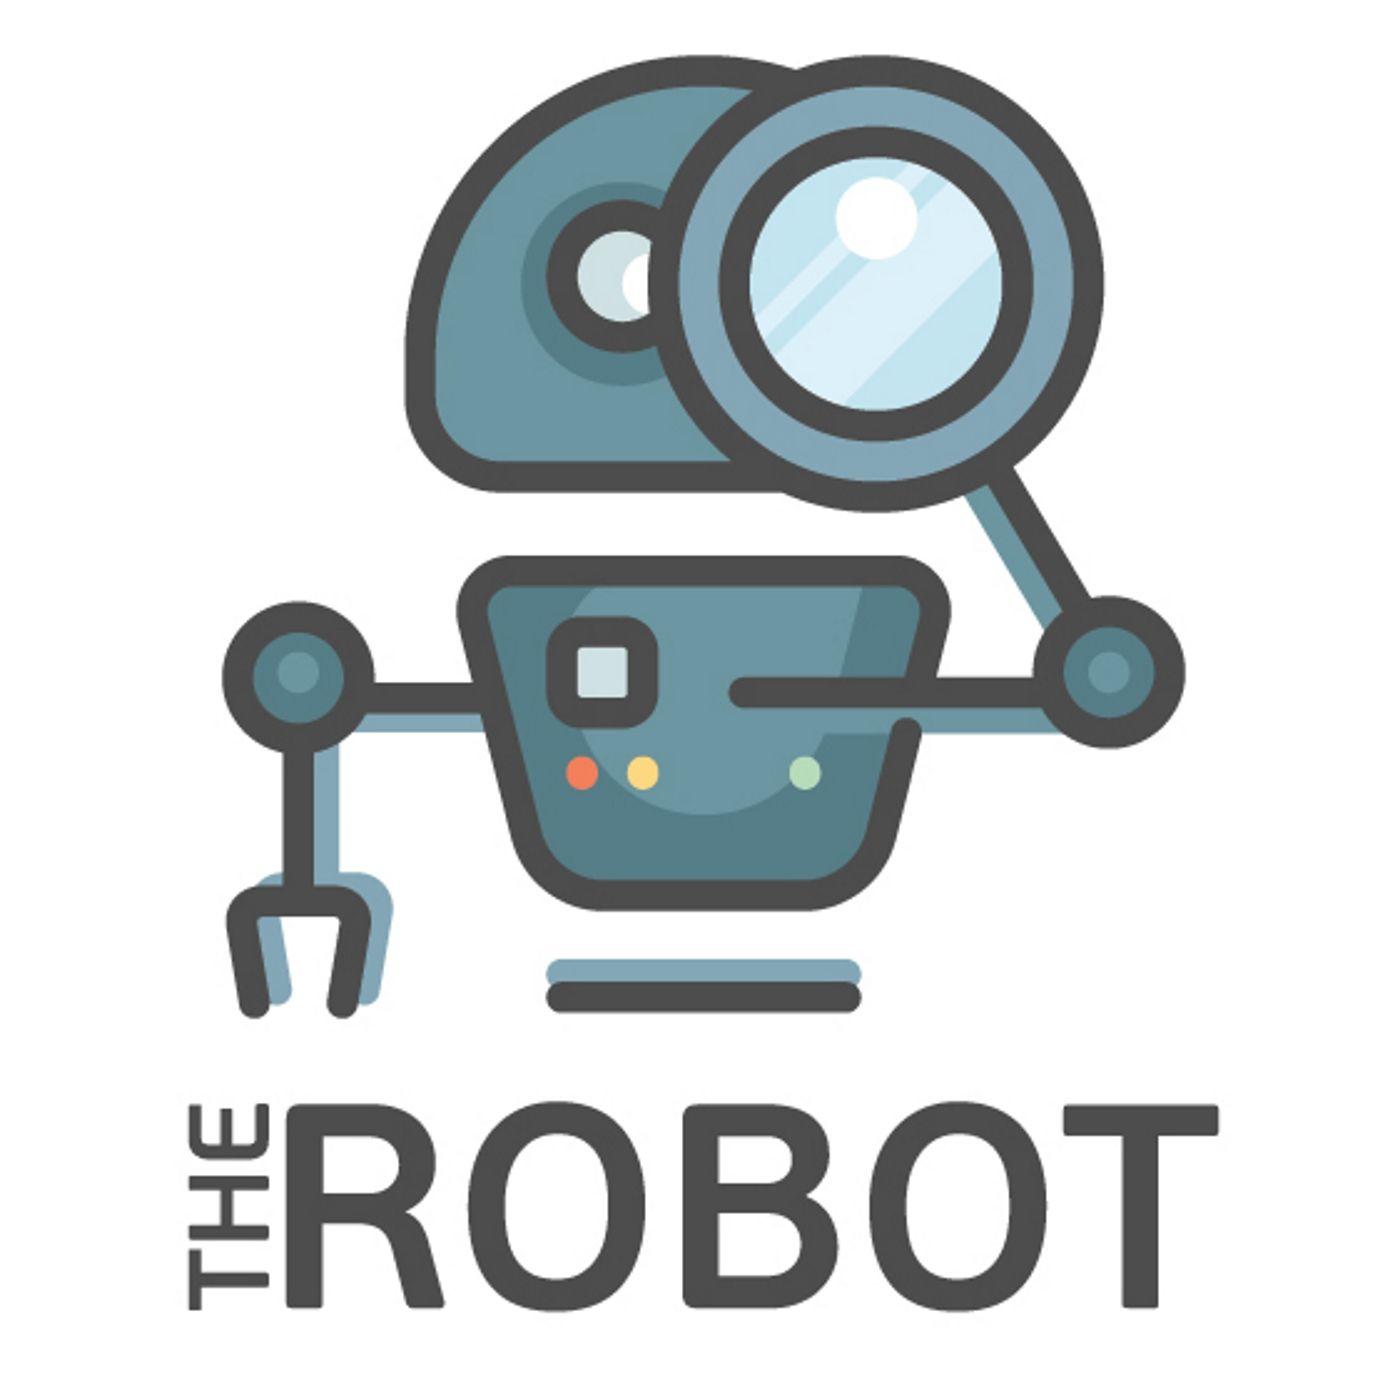 The Robot